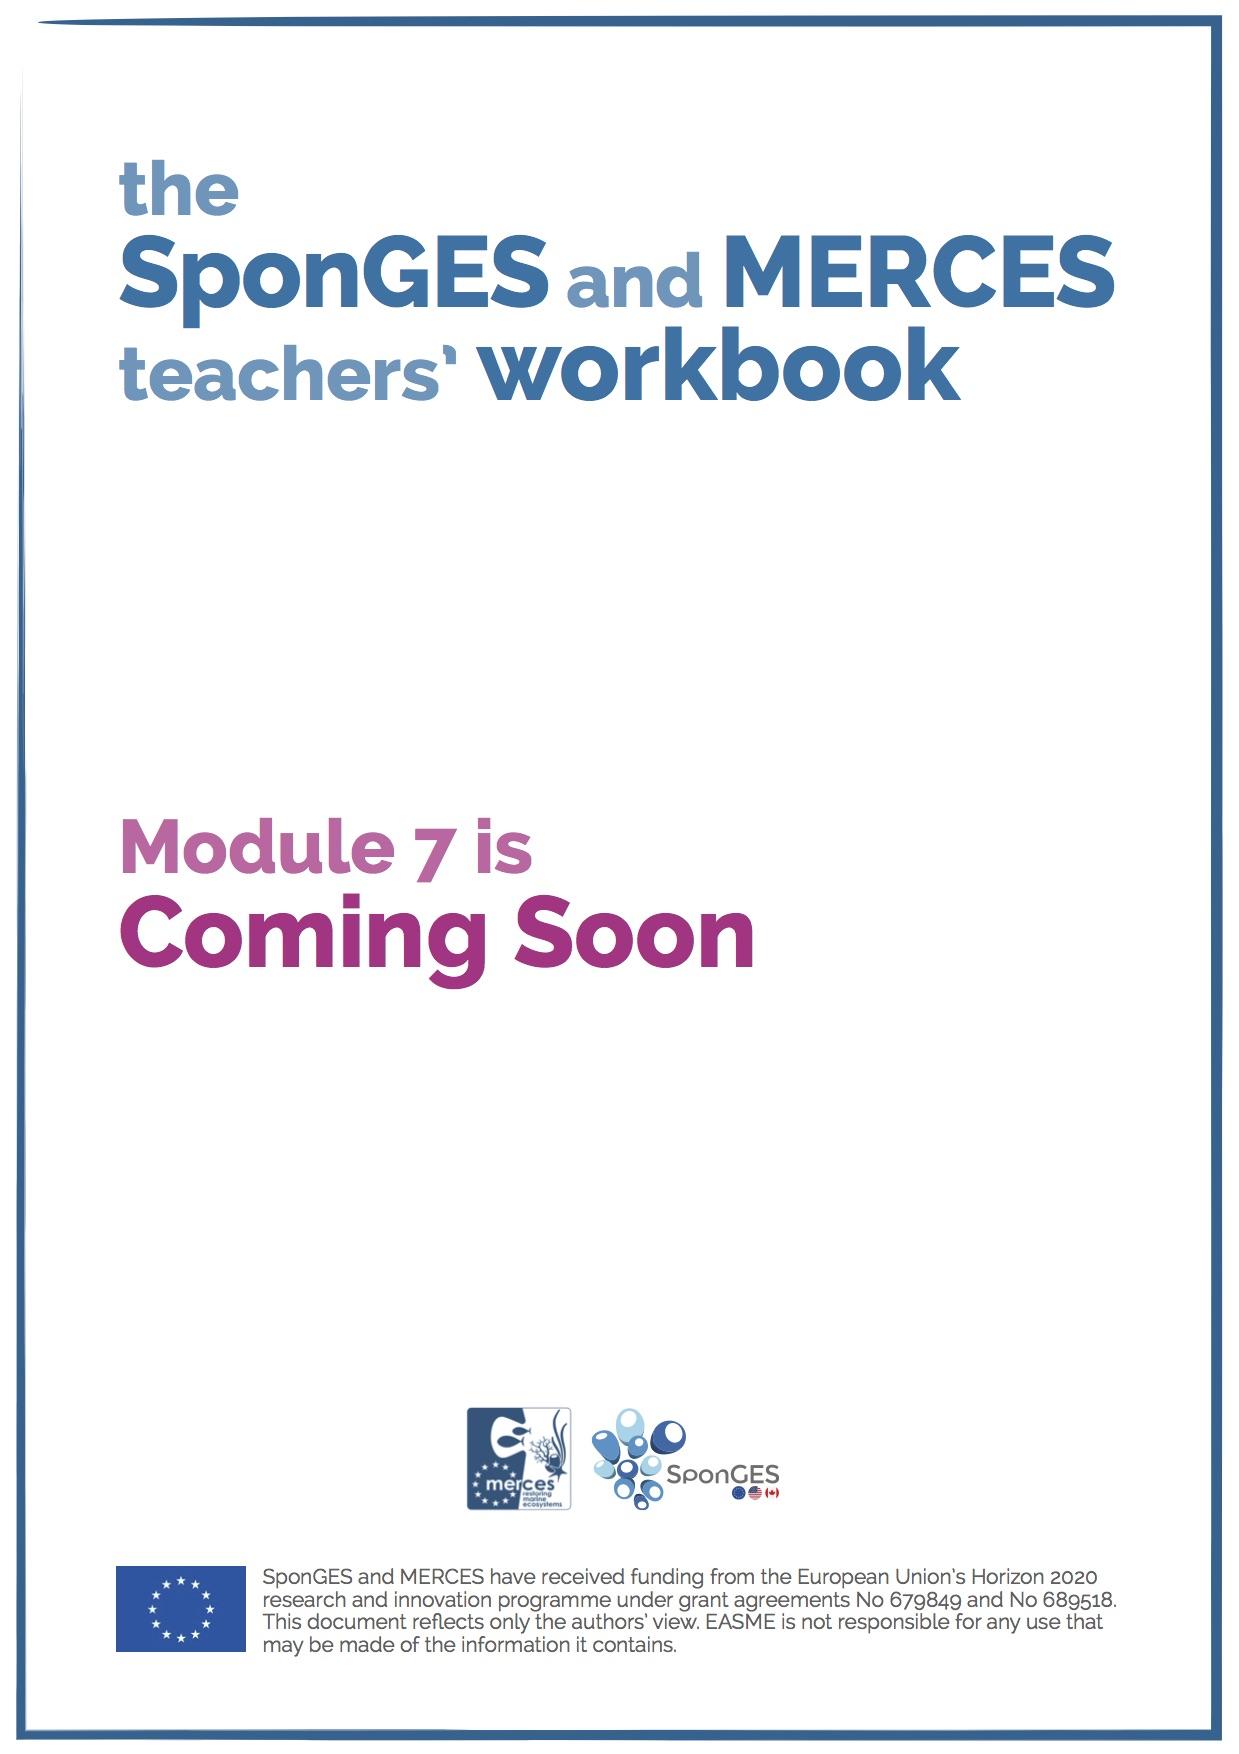 Module 7 of the SponGES and MERCES teachers' workbook